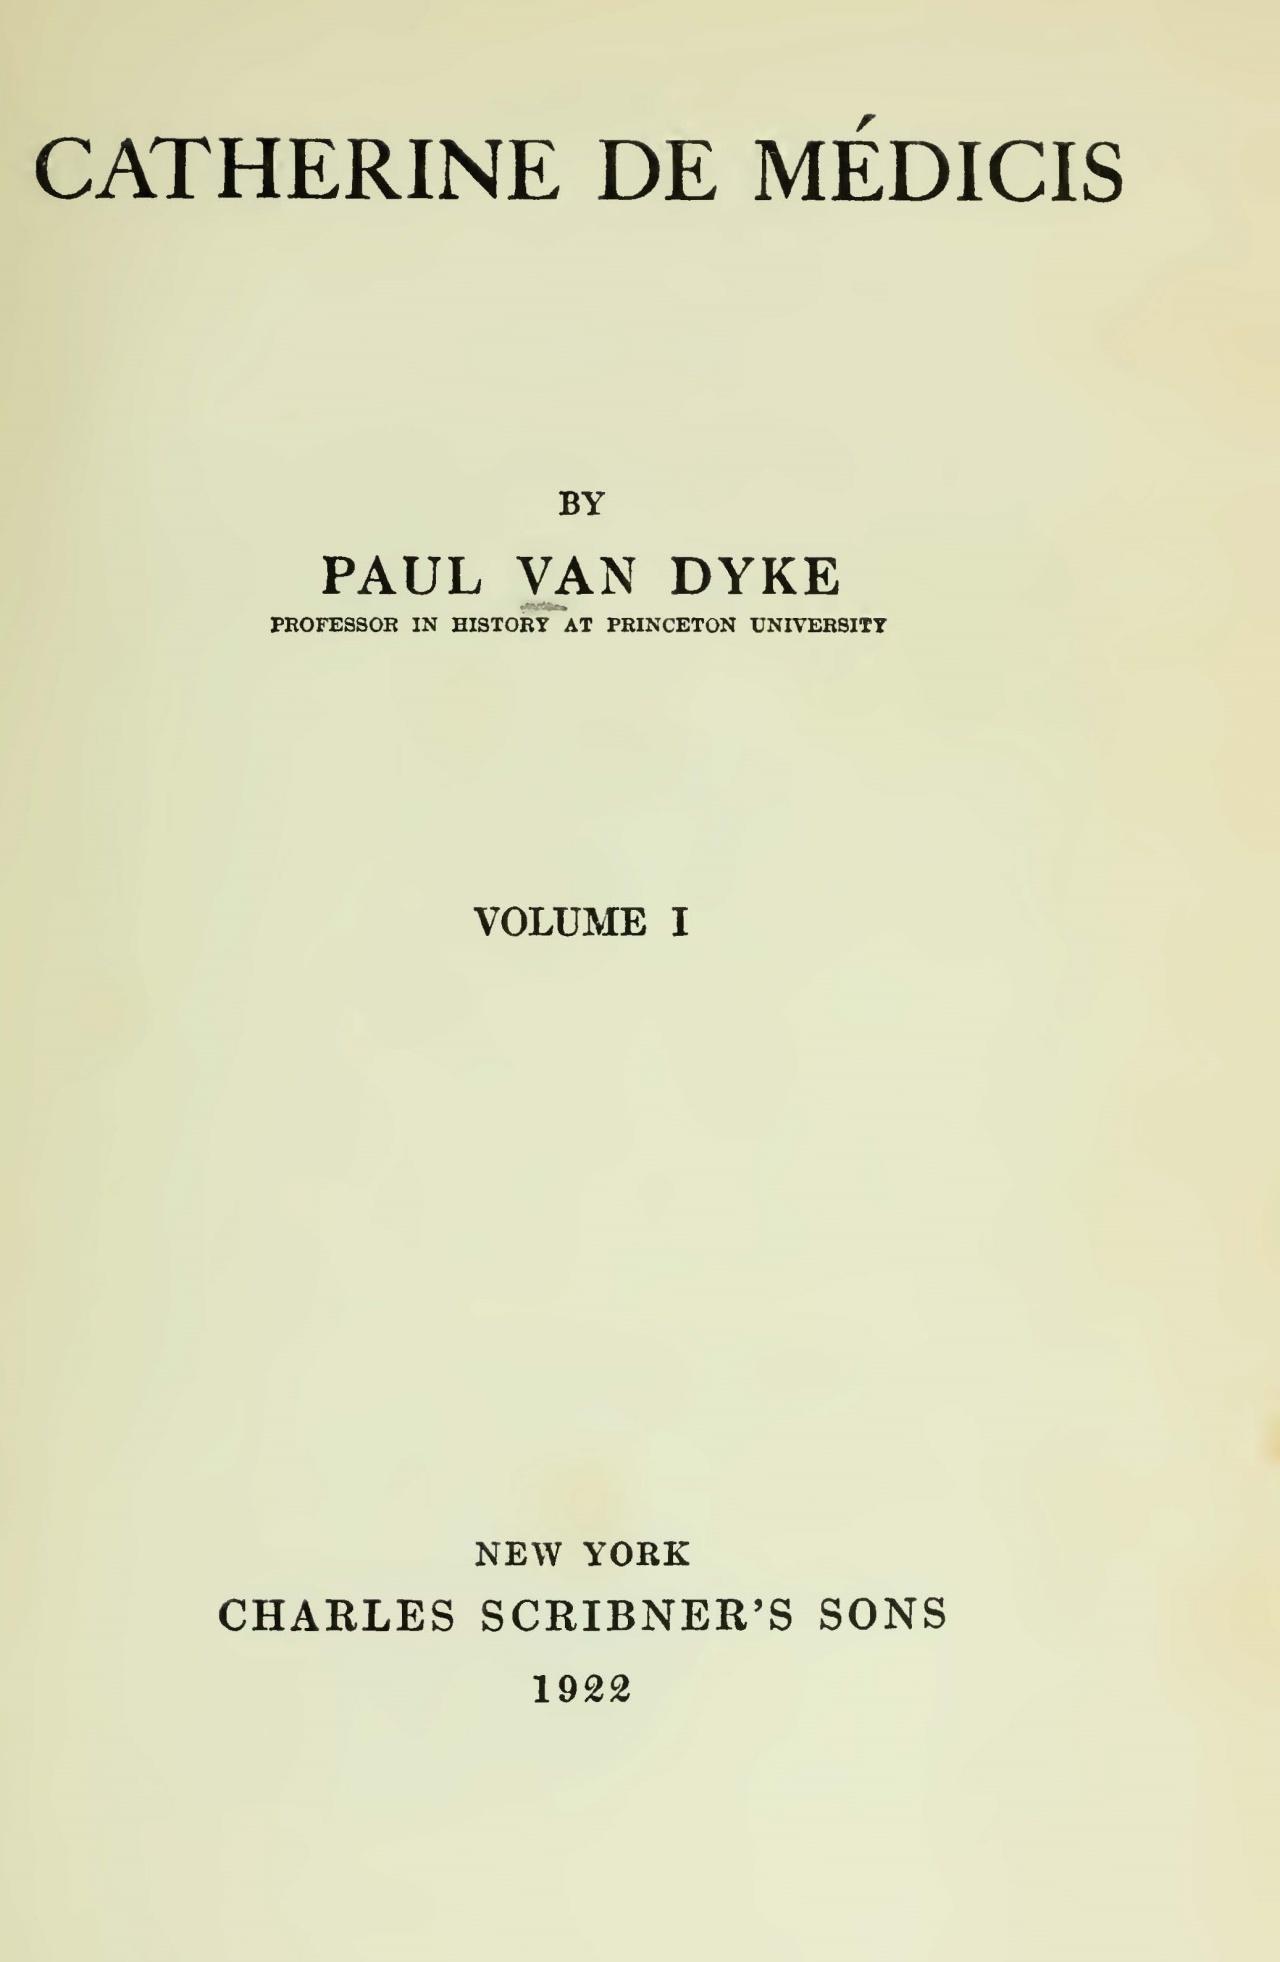 Van Dyke, Paul, Catherine de Medicis, Vol. 1 Title Page.jpg